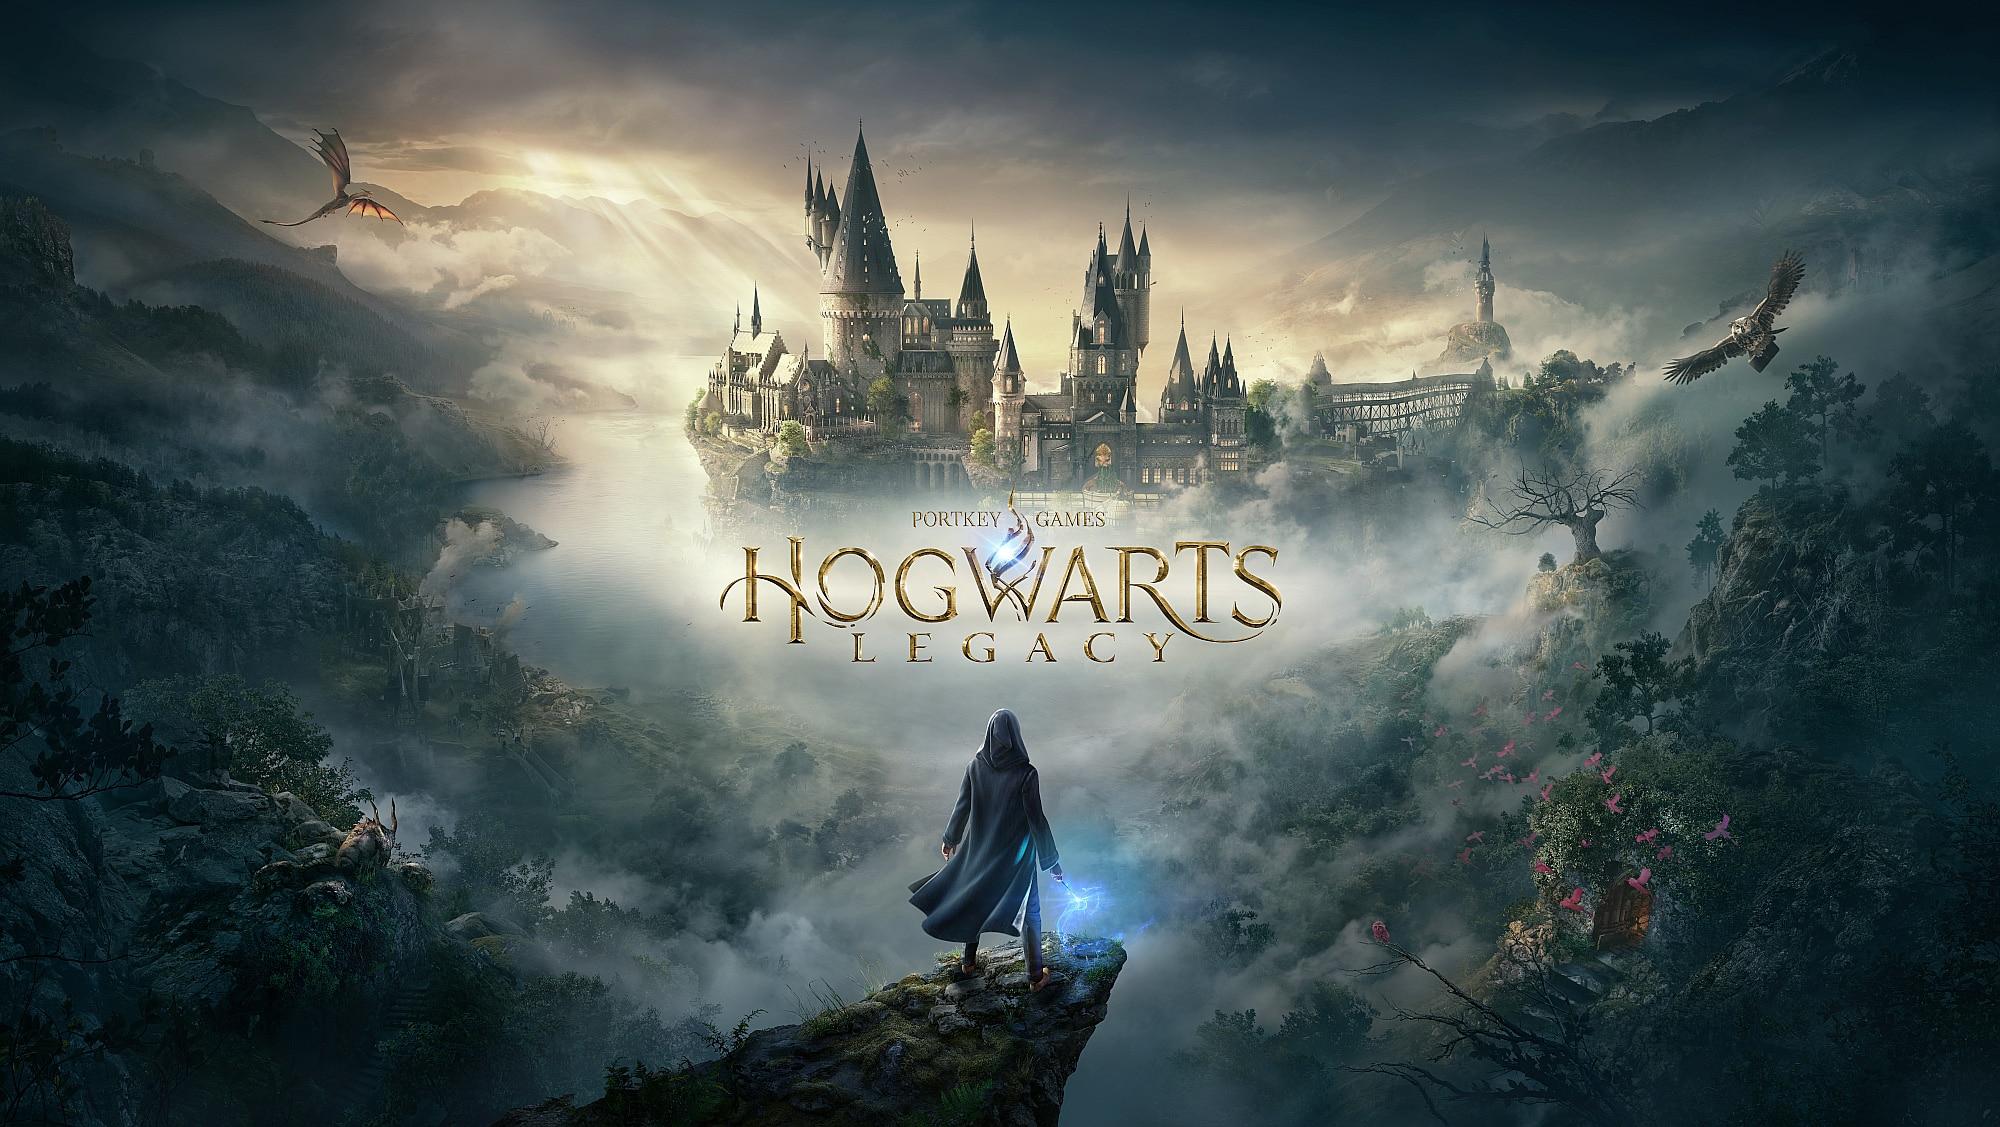 Hogwarts Legacy (c) Warner Bros. Games